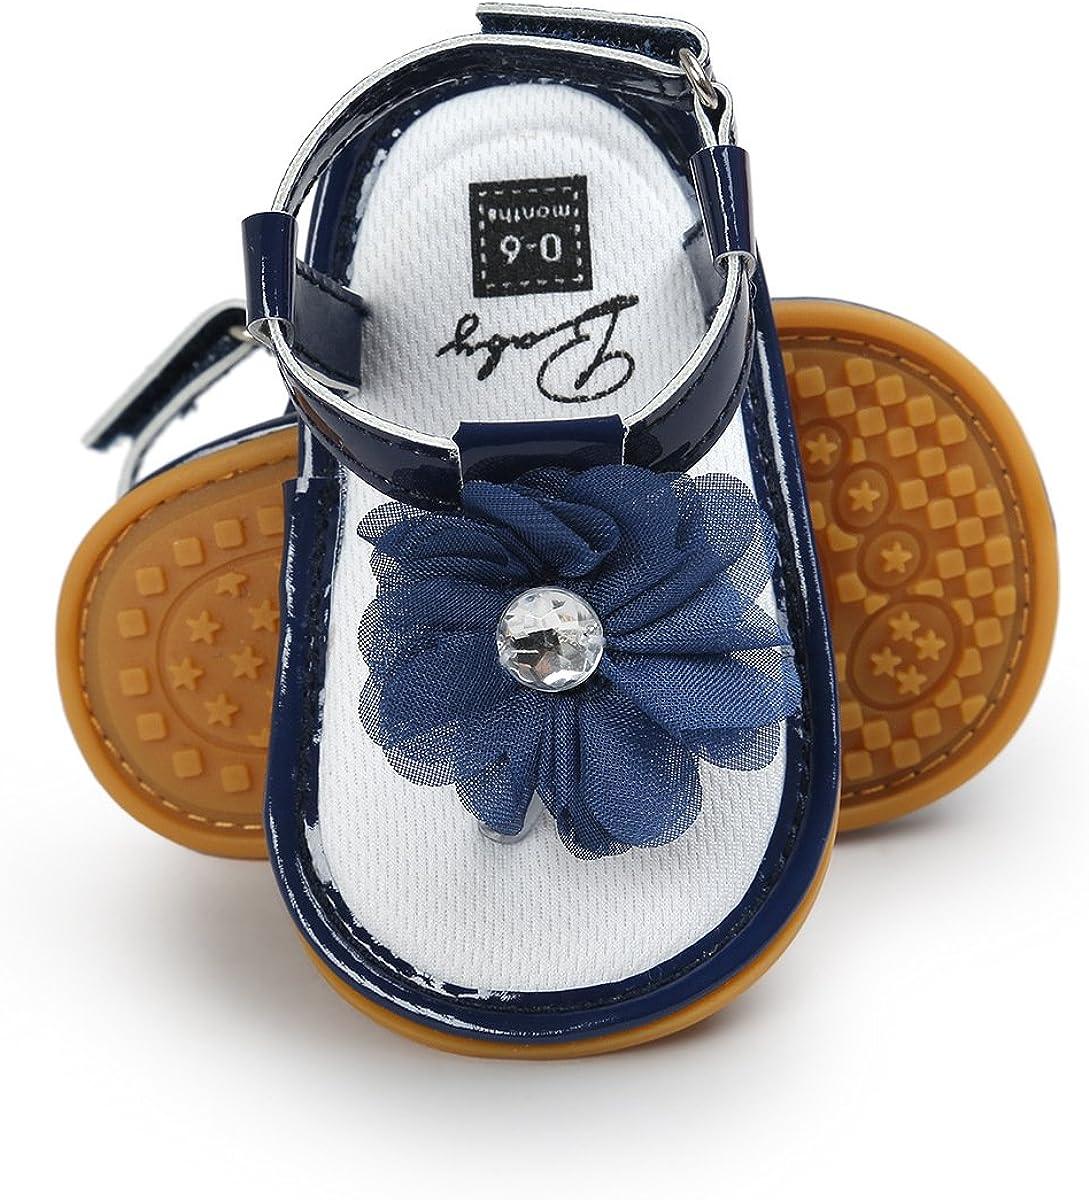 ENERCAKE Infant Baby Girls Sandals Fla Soft T-Strap Toddler Branded goods Online limited product Sole